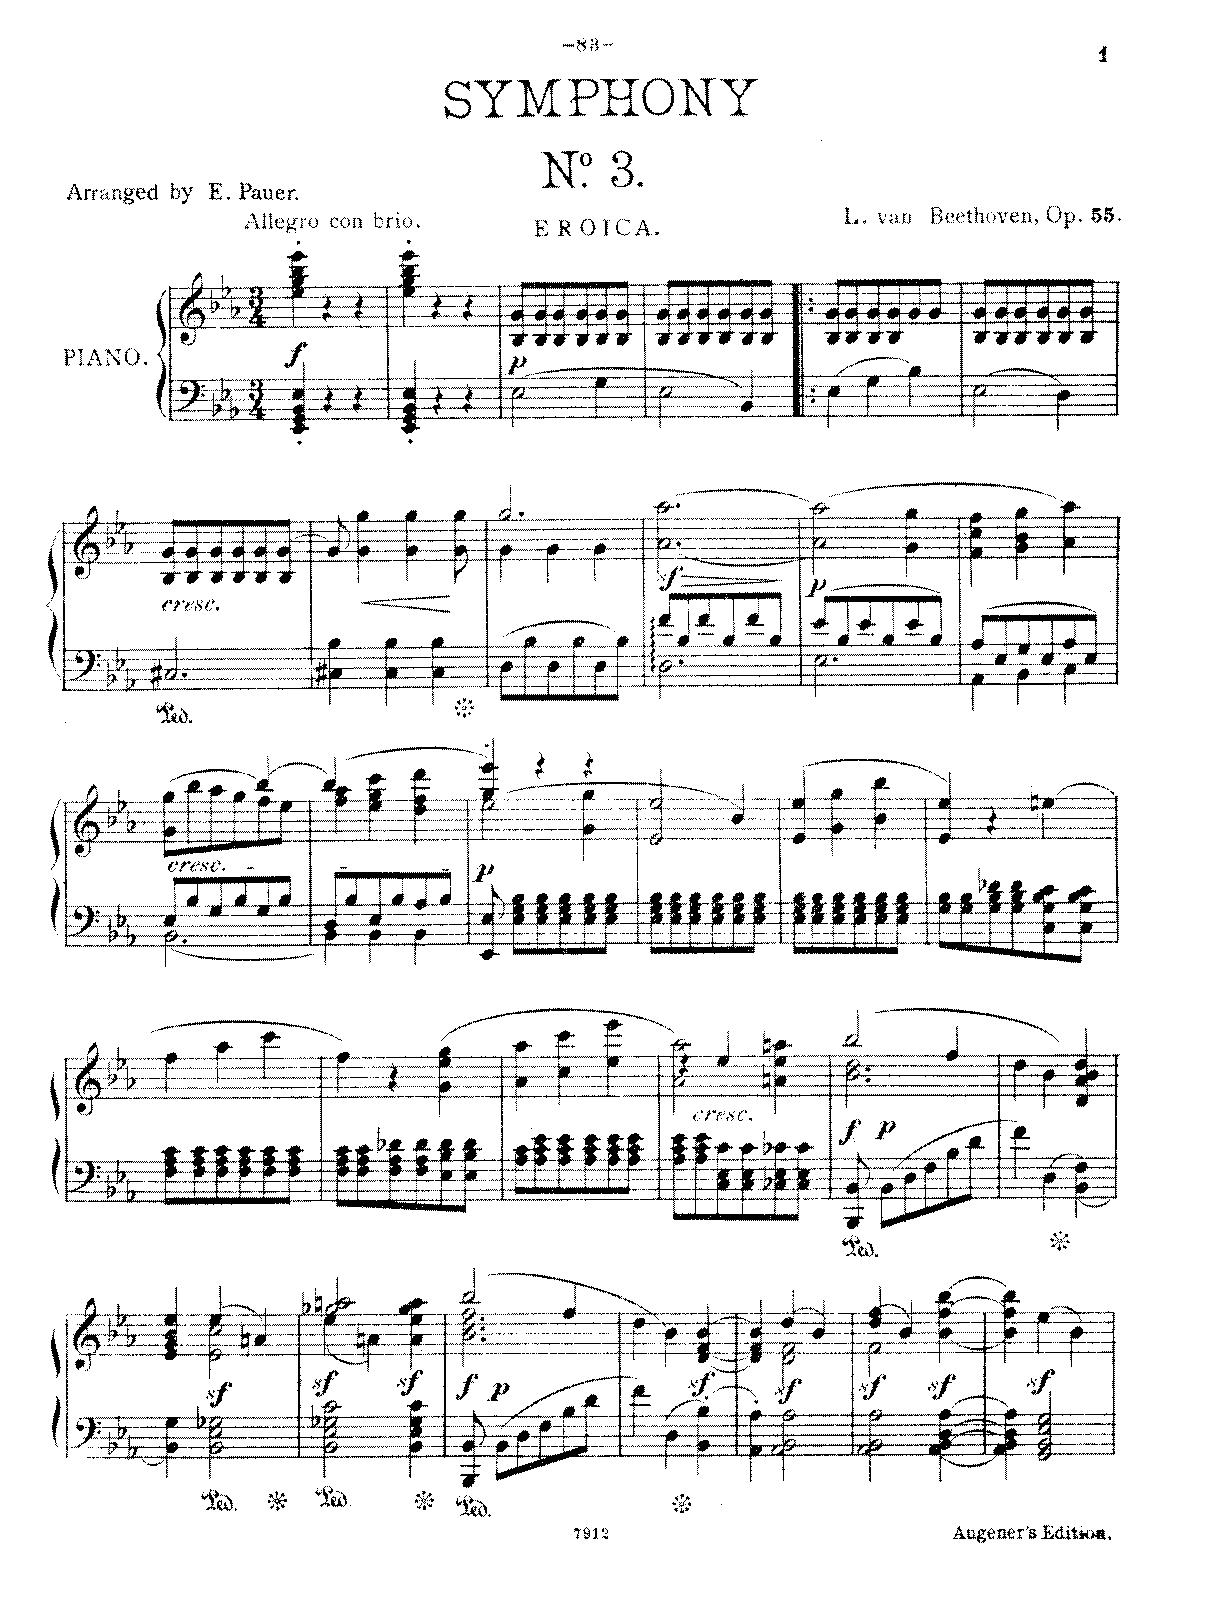 Symphony No. 9 (Beethoven)